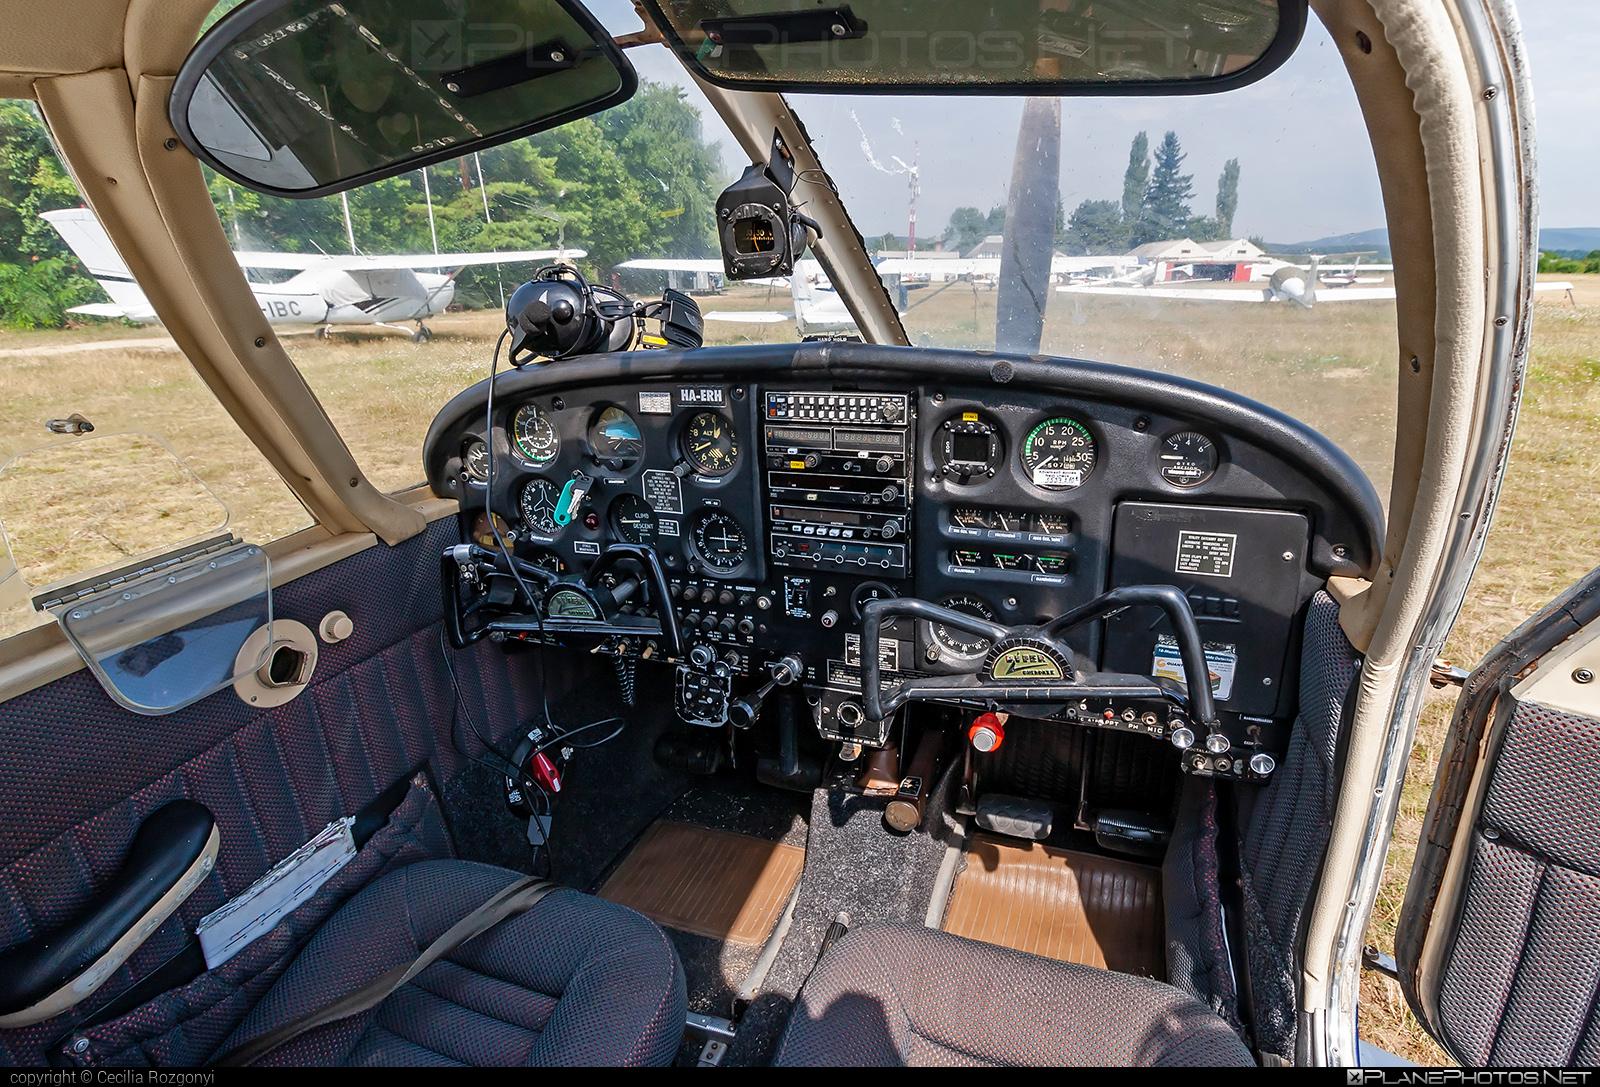 Piper PA-28-140 Cherokee Cruiser - HA-ERH operated by Magyar Pilóta Akadémia Kft. #magyarpilotaakademia #piper